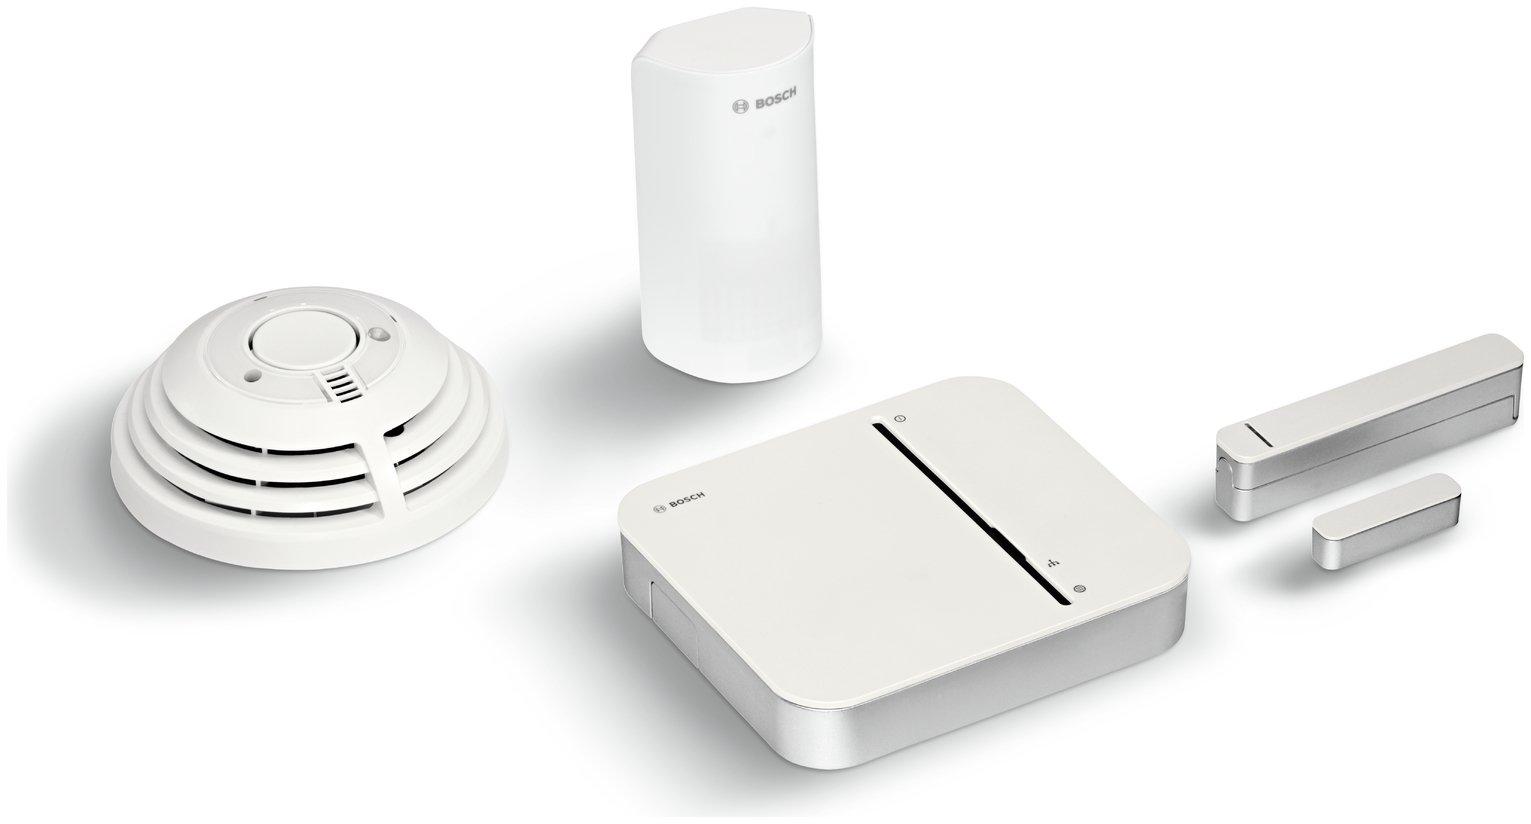 Image of Bosch Smart Home Security Starter Set